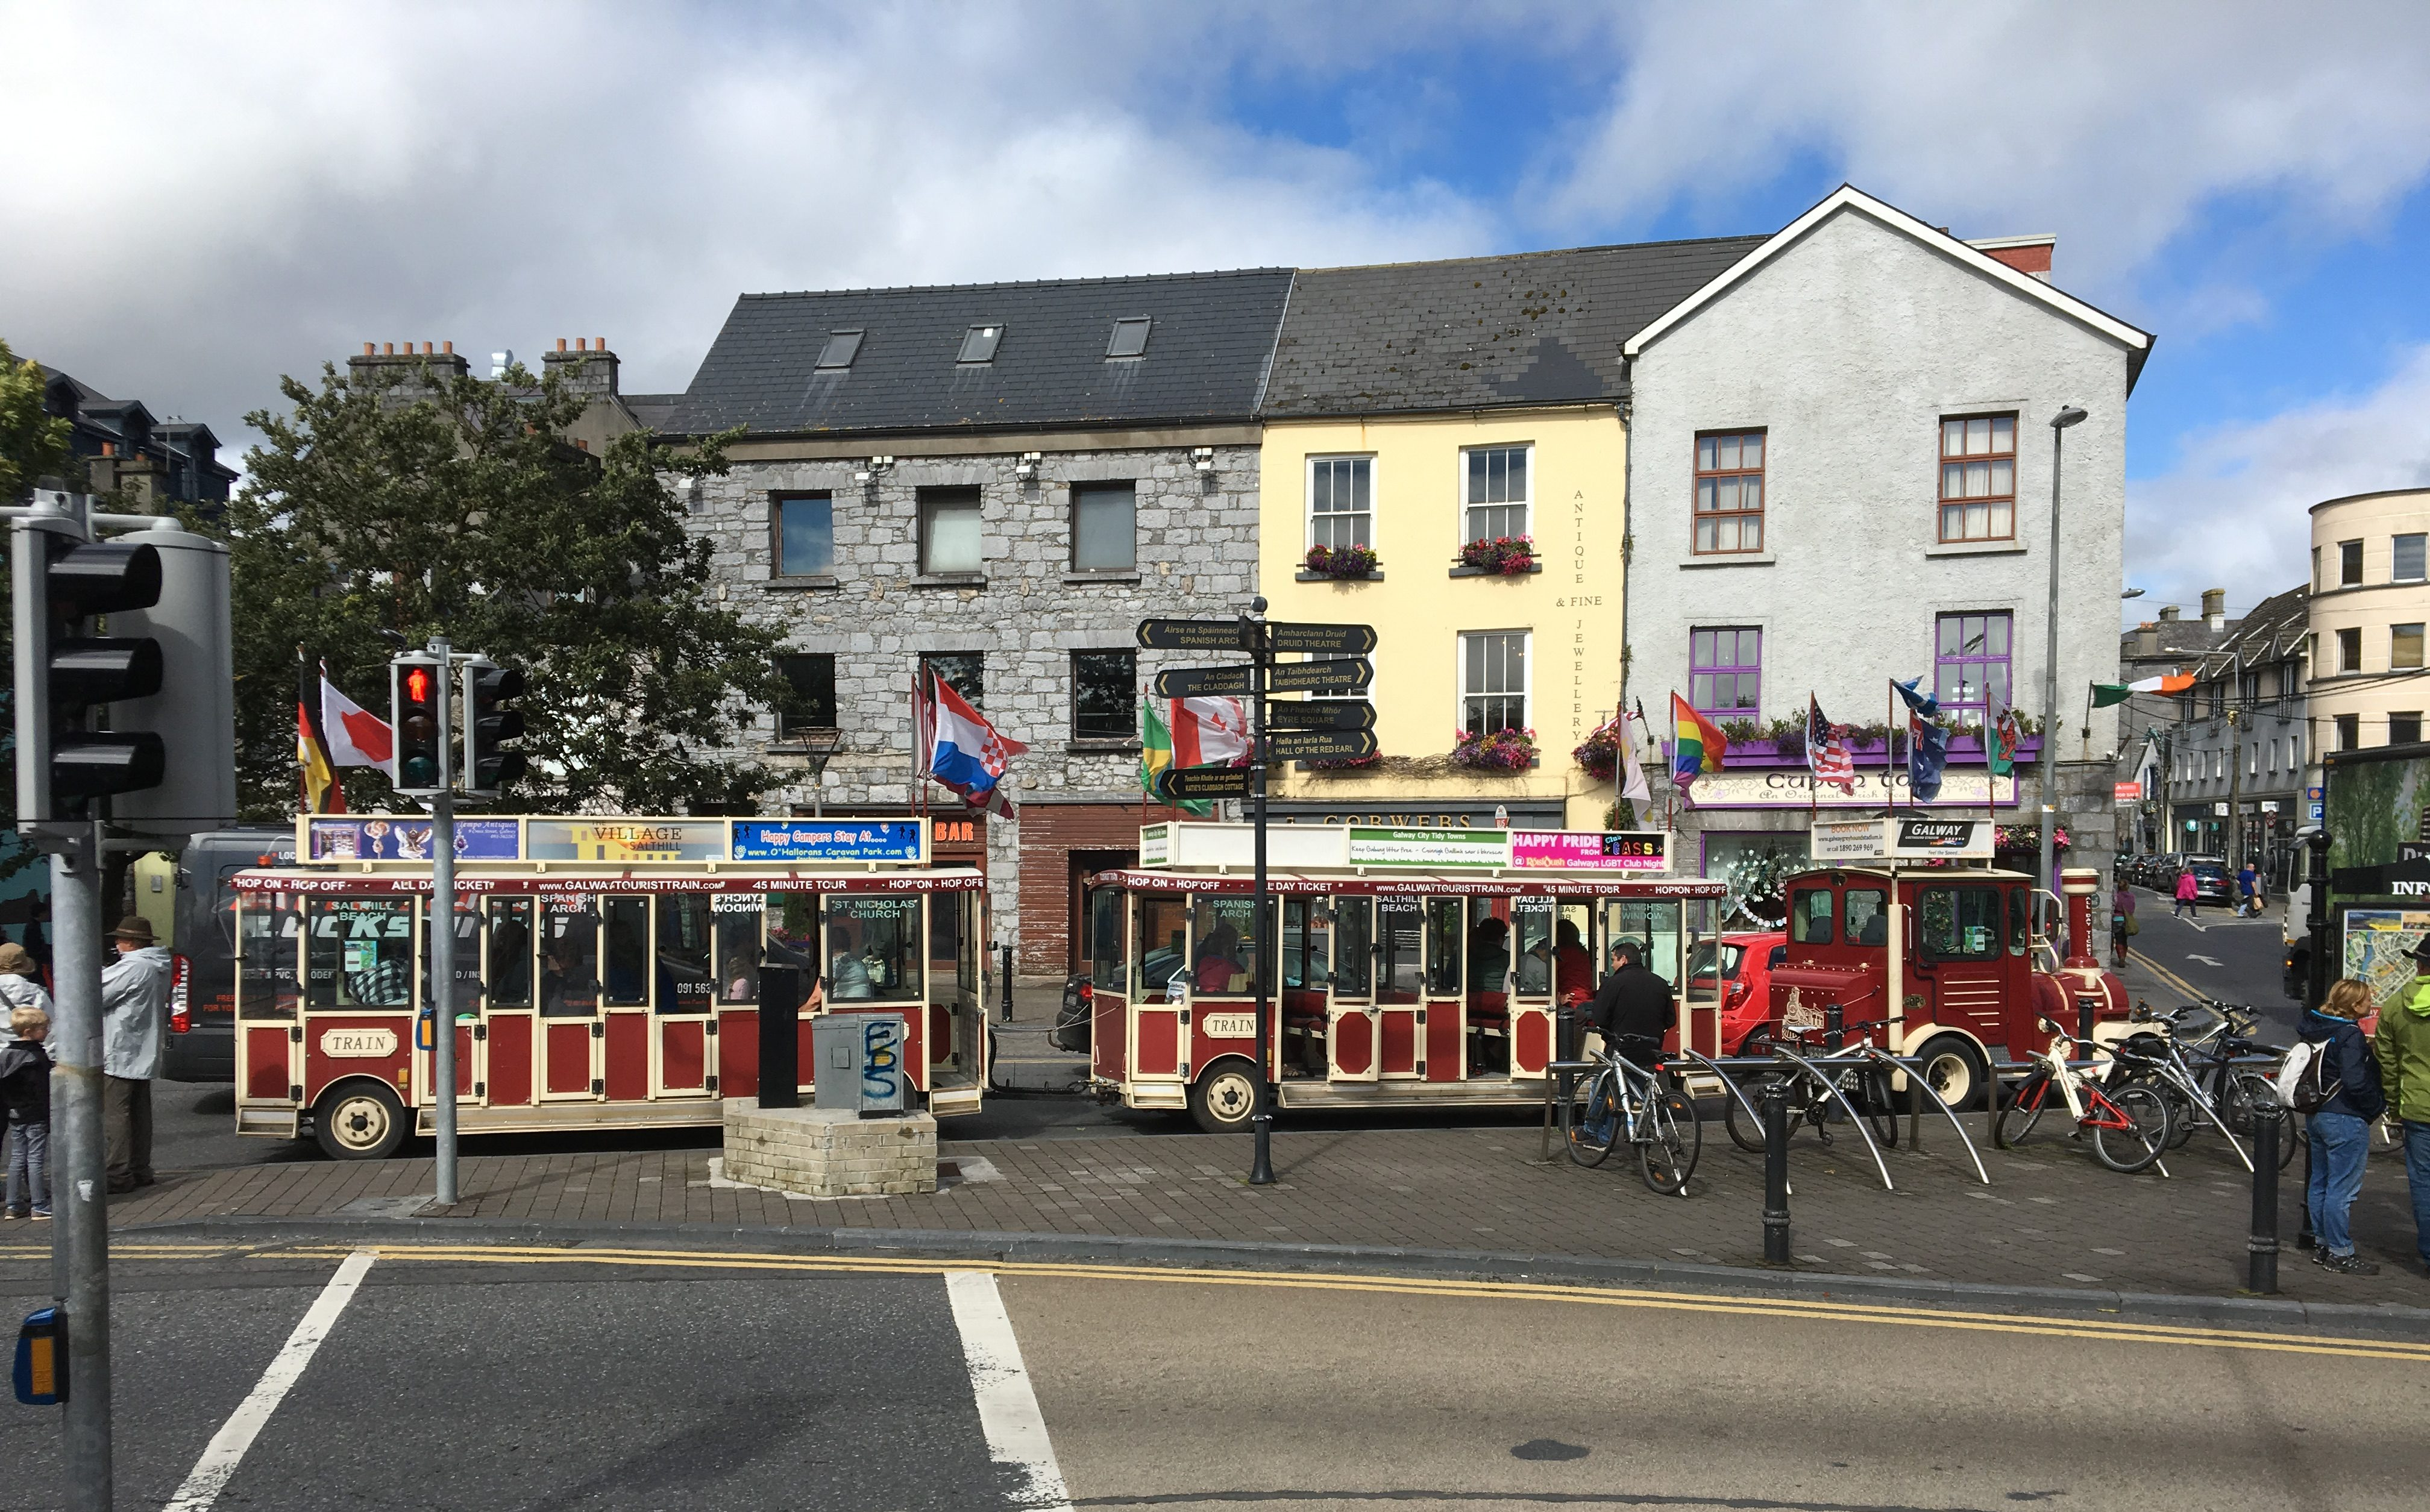 Tourbahn in Galway